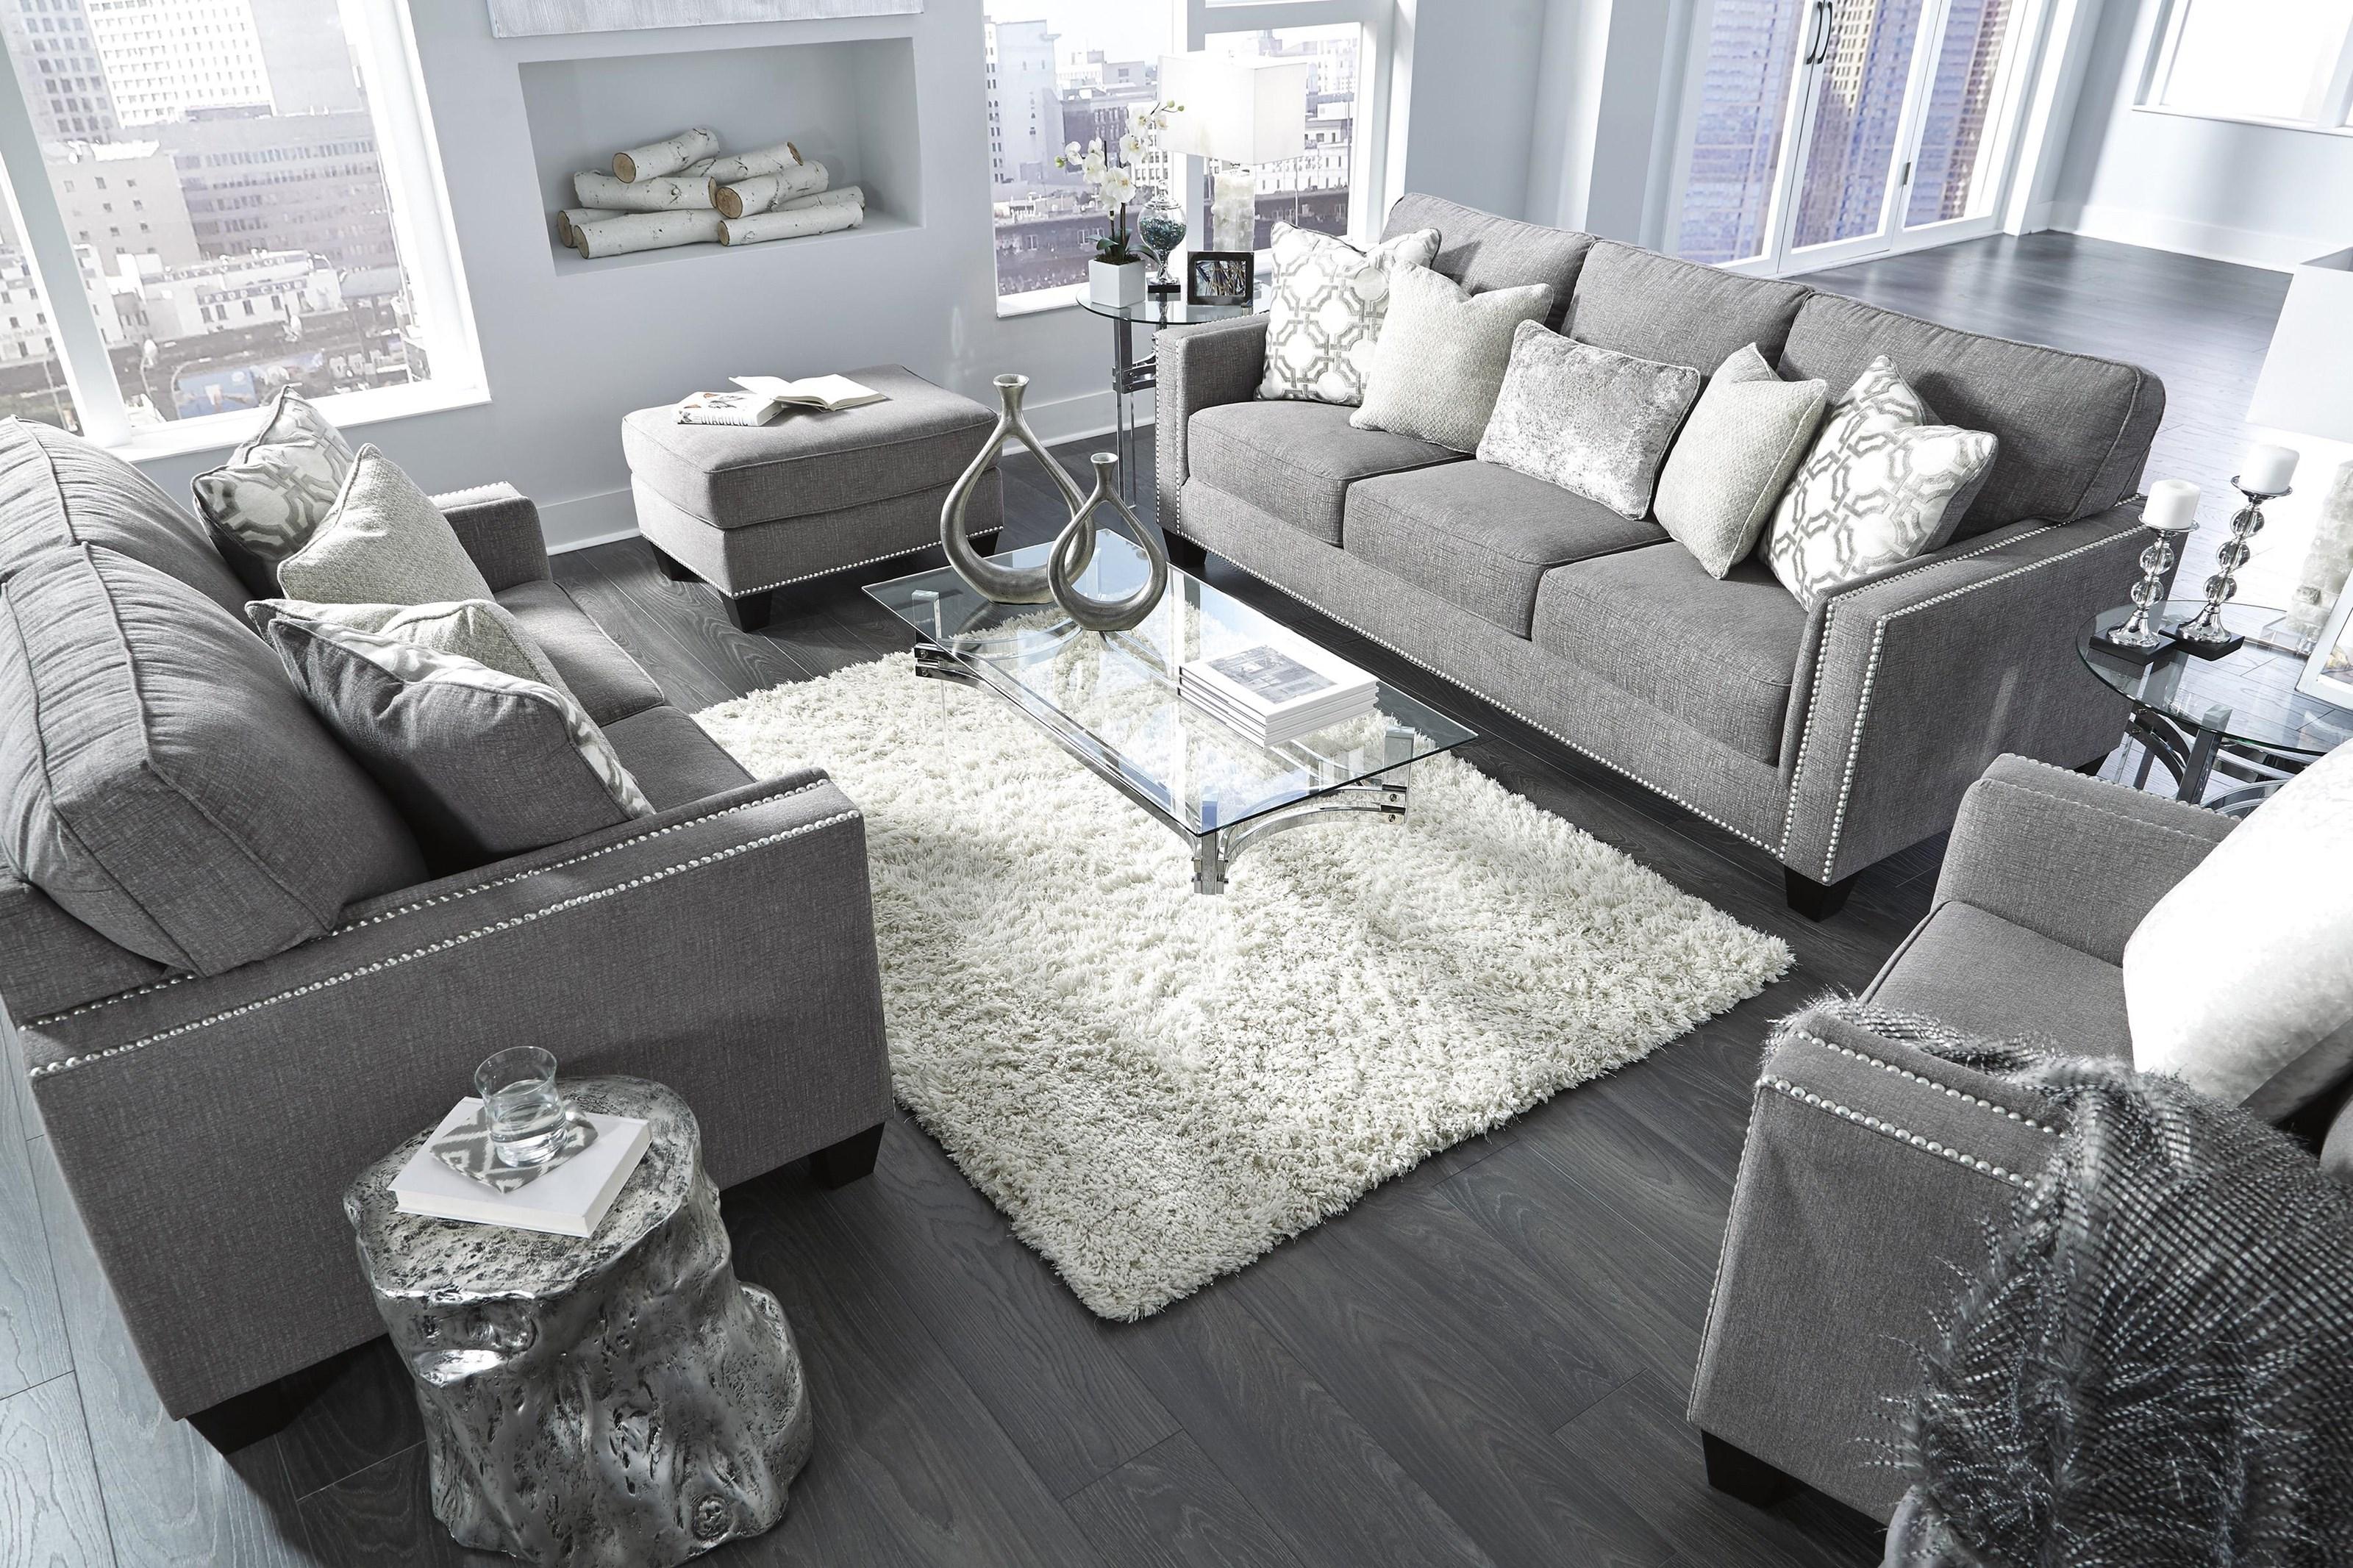 Sofa, Loveseat, Chair and Ottoman Se